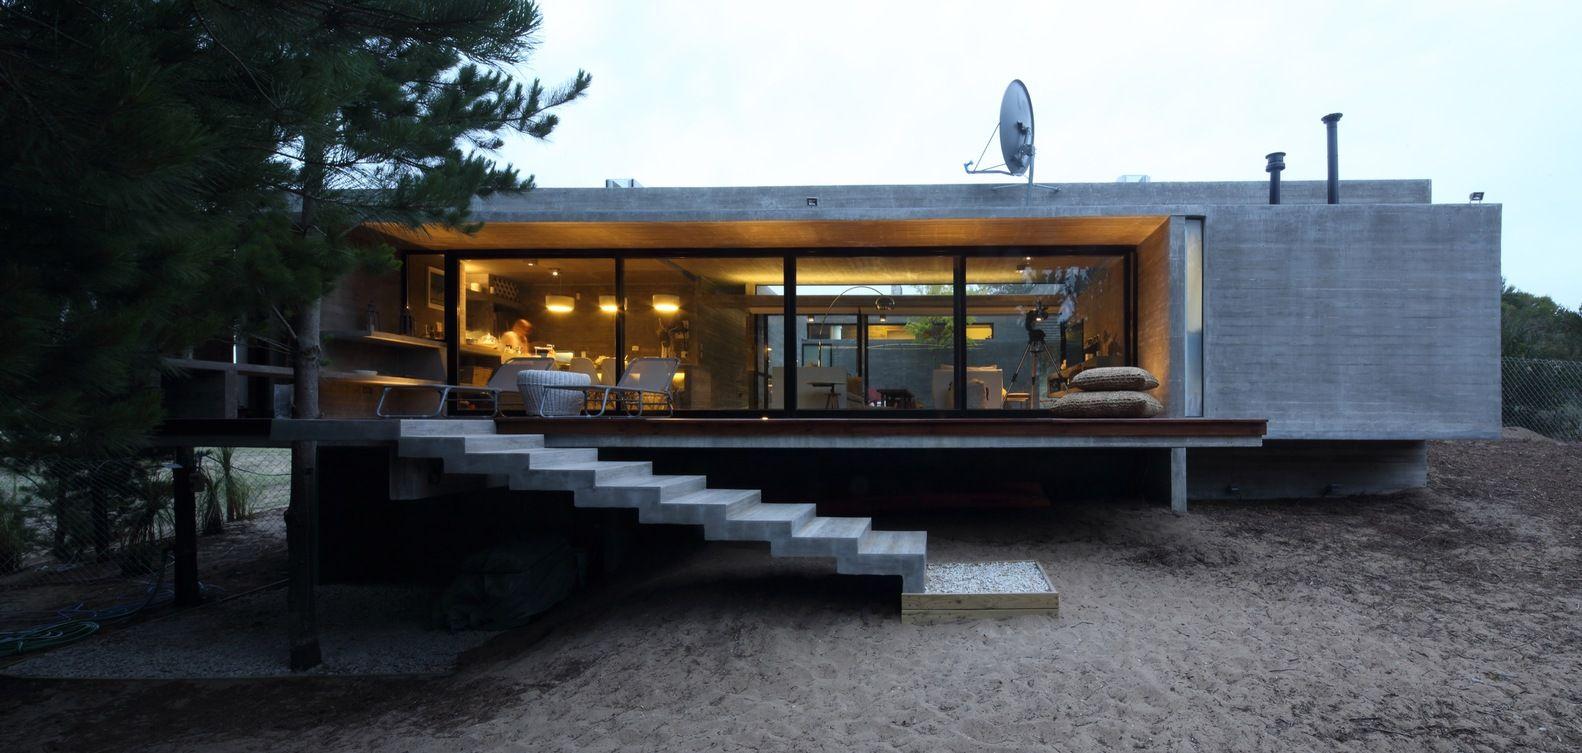 Galeria De Casa S S Besonias Almeida Arquitectos 6 Architecture Modern Small House Design Architecture House